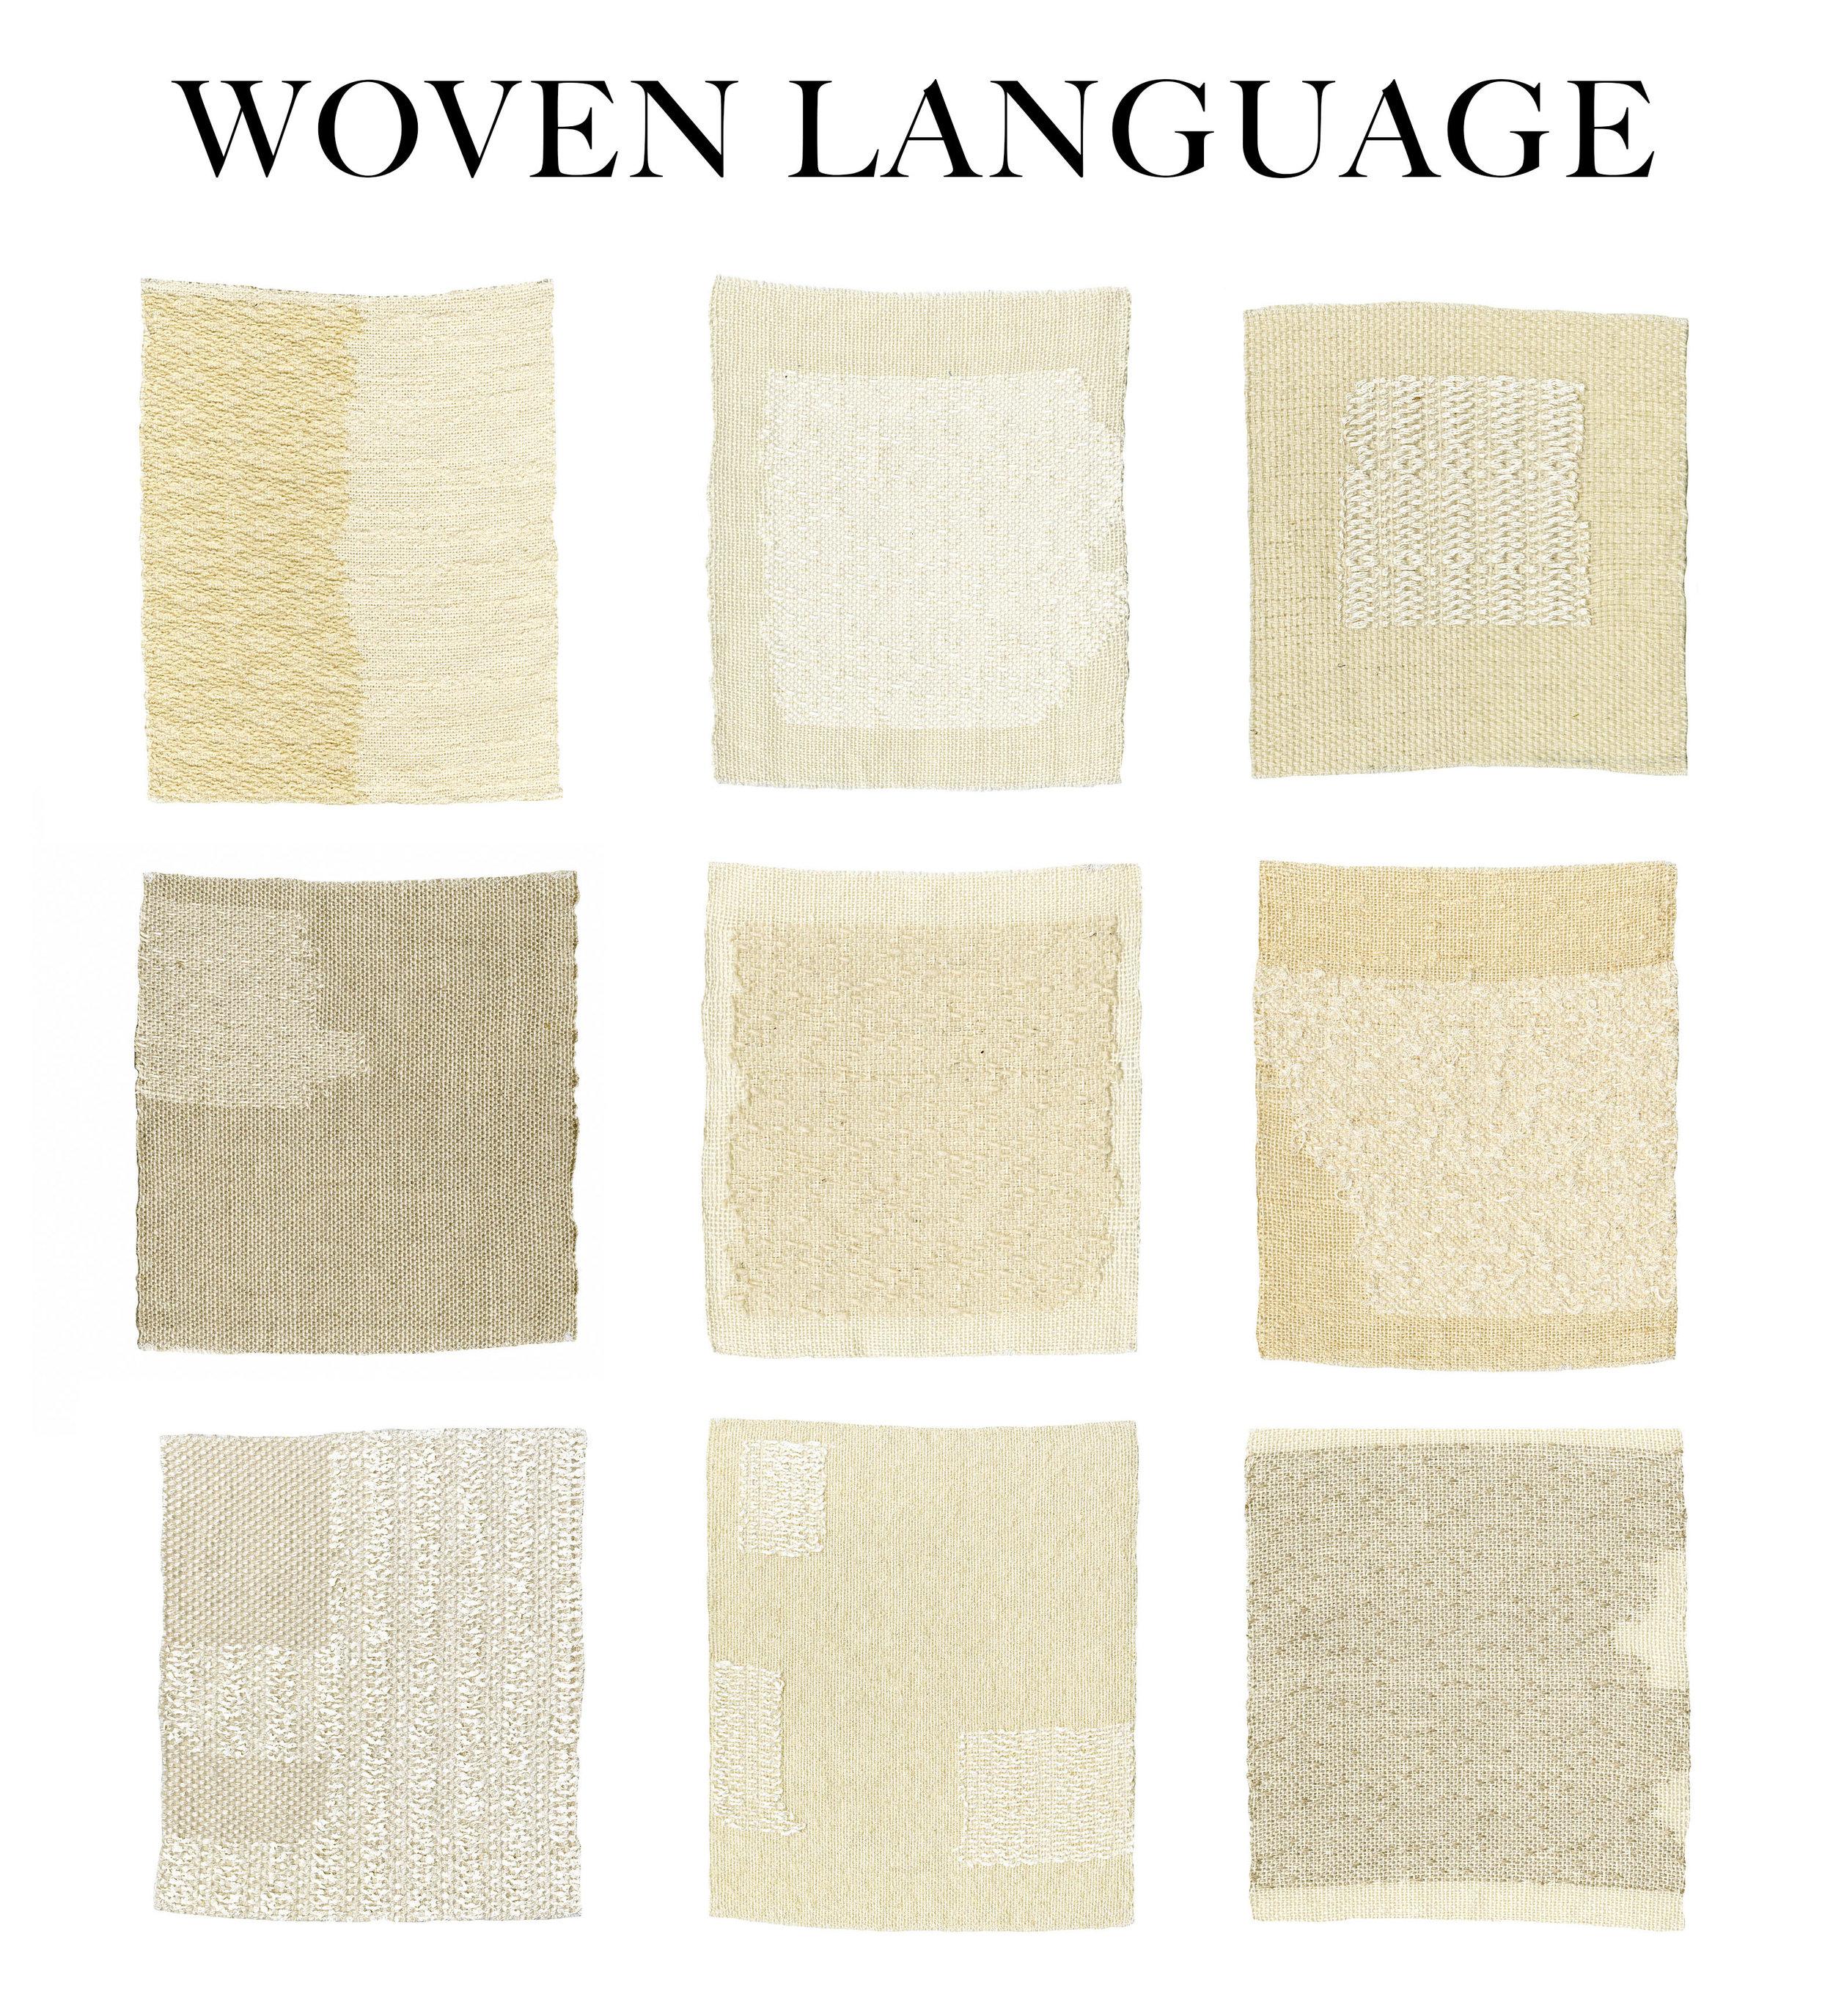 woven language.jpg